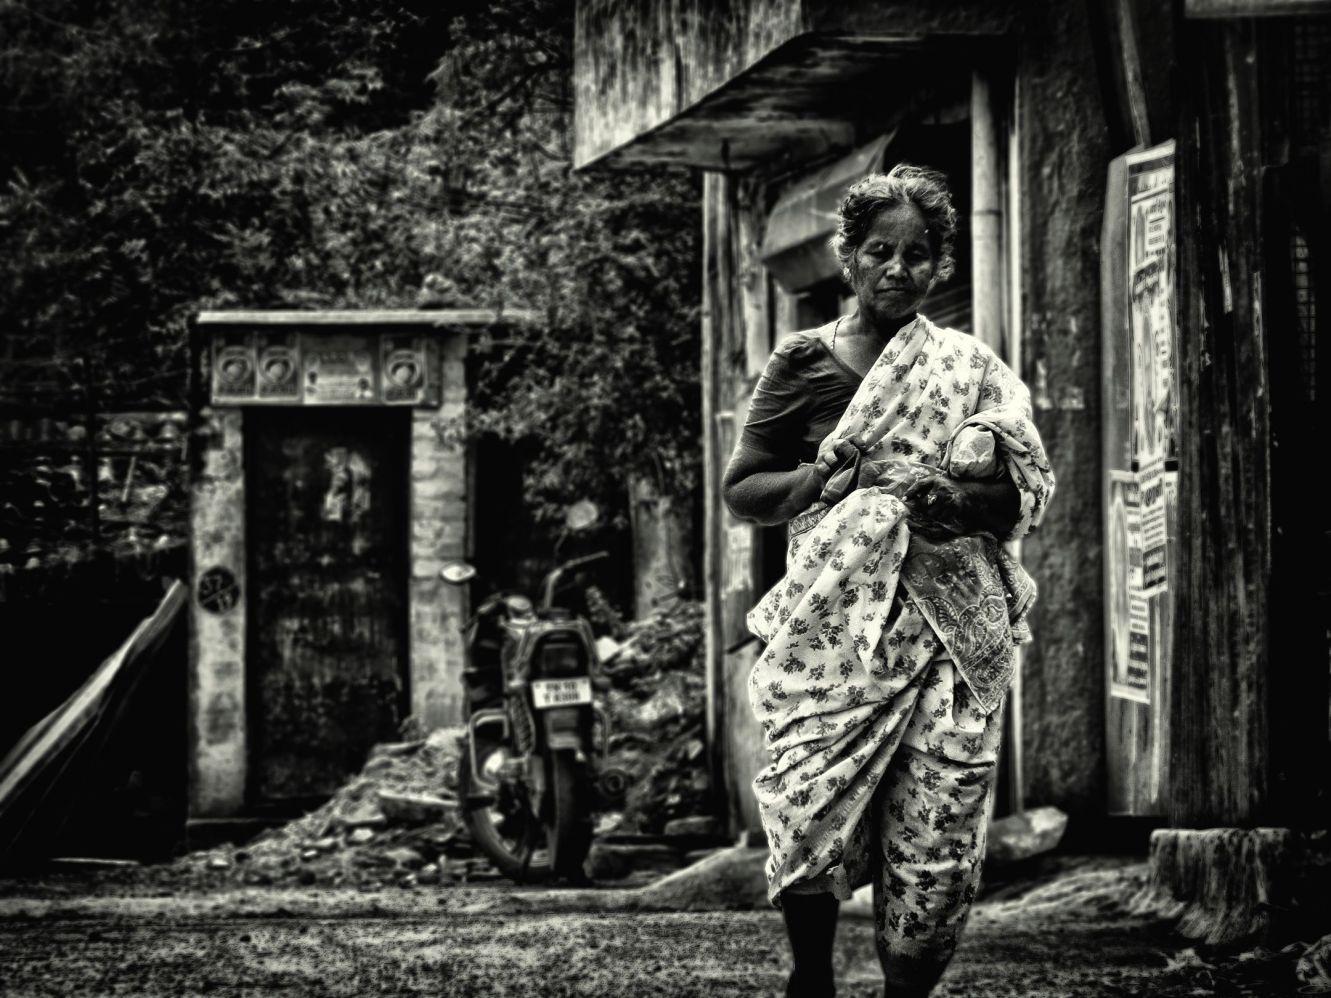 old-lady-walking-alone-wordpress